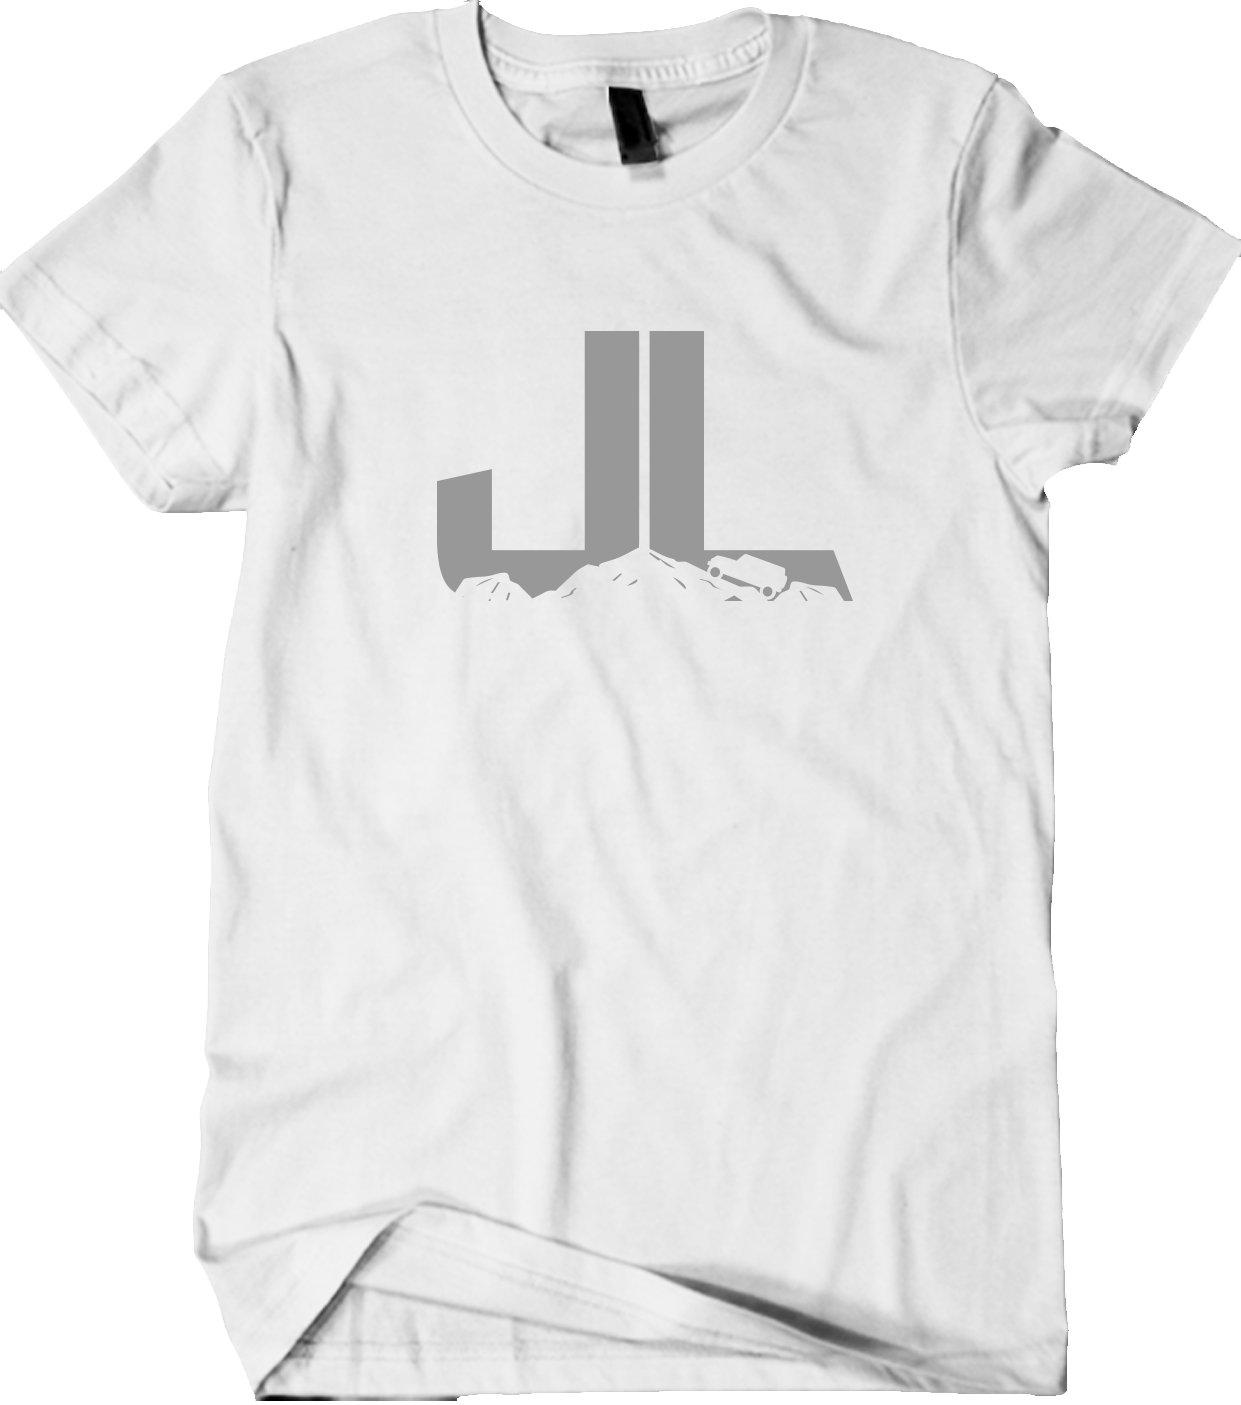 JL JEEP Shirt - Jeep Climber Shirt - Unisex - Super Soft - Gray print